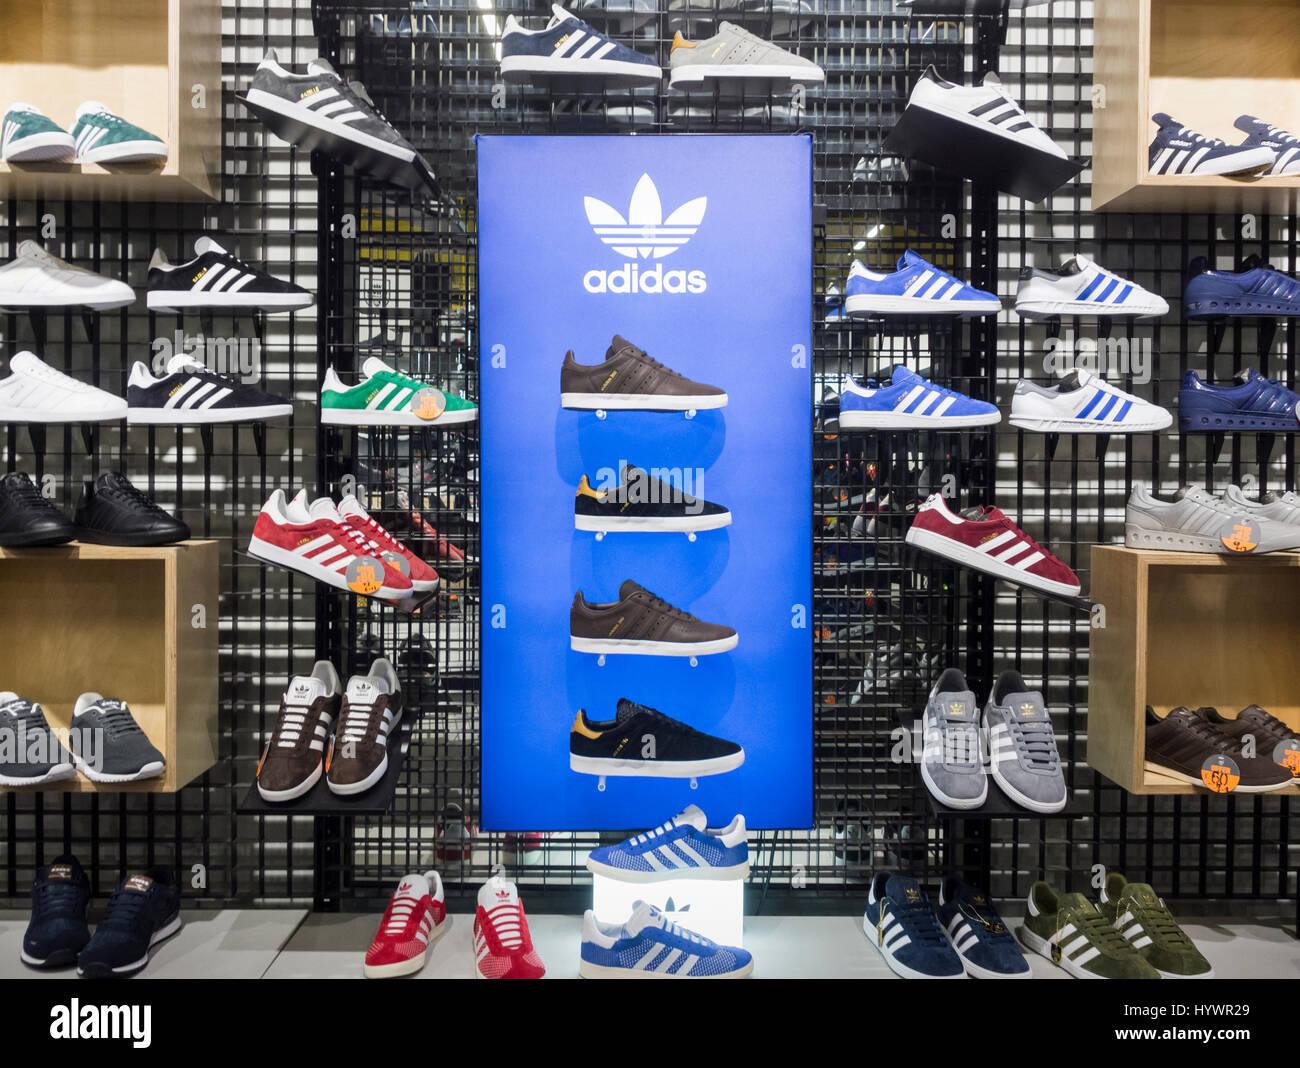 jd sports adidas schuhe